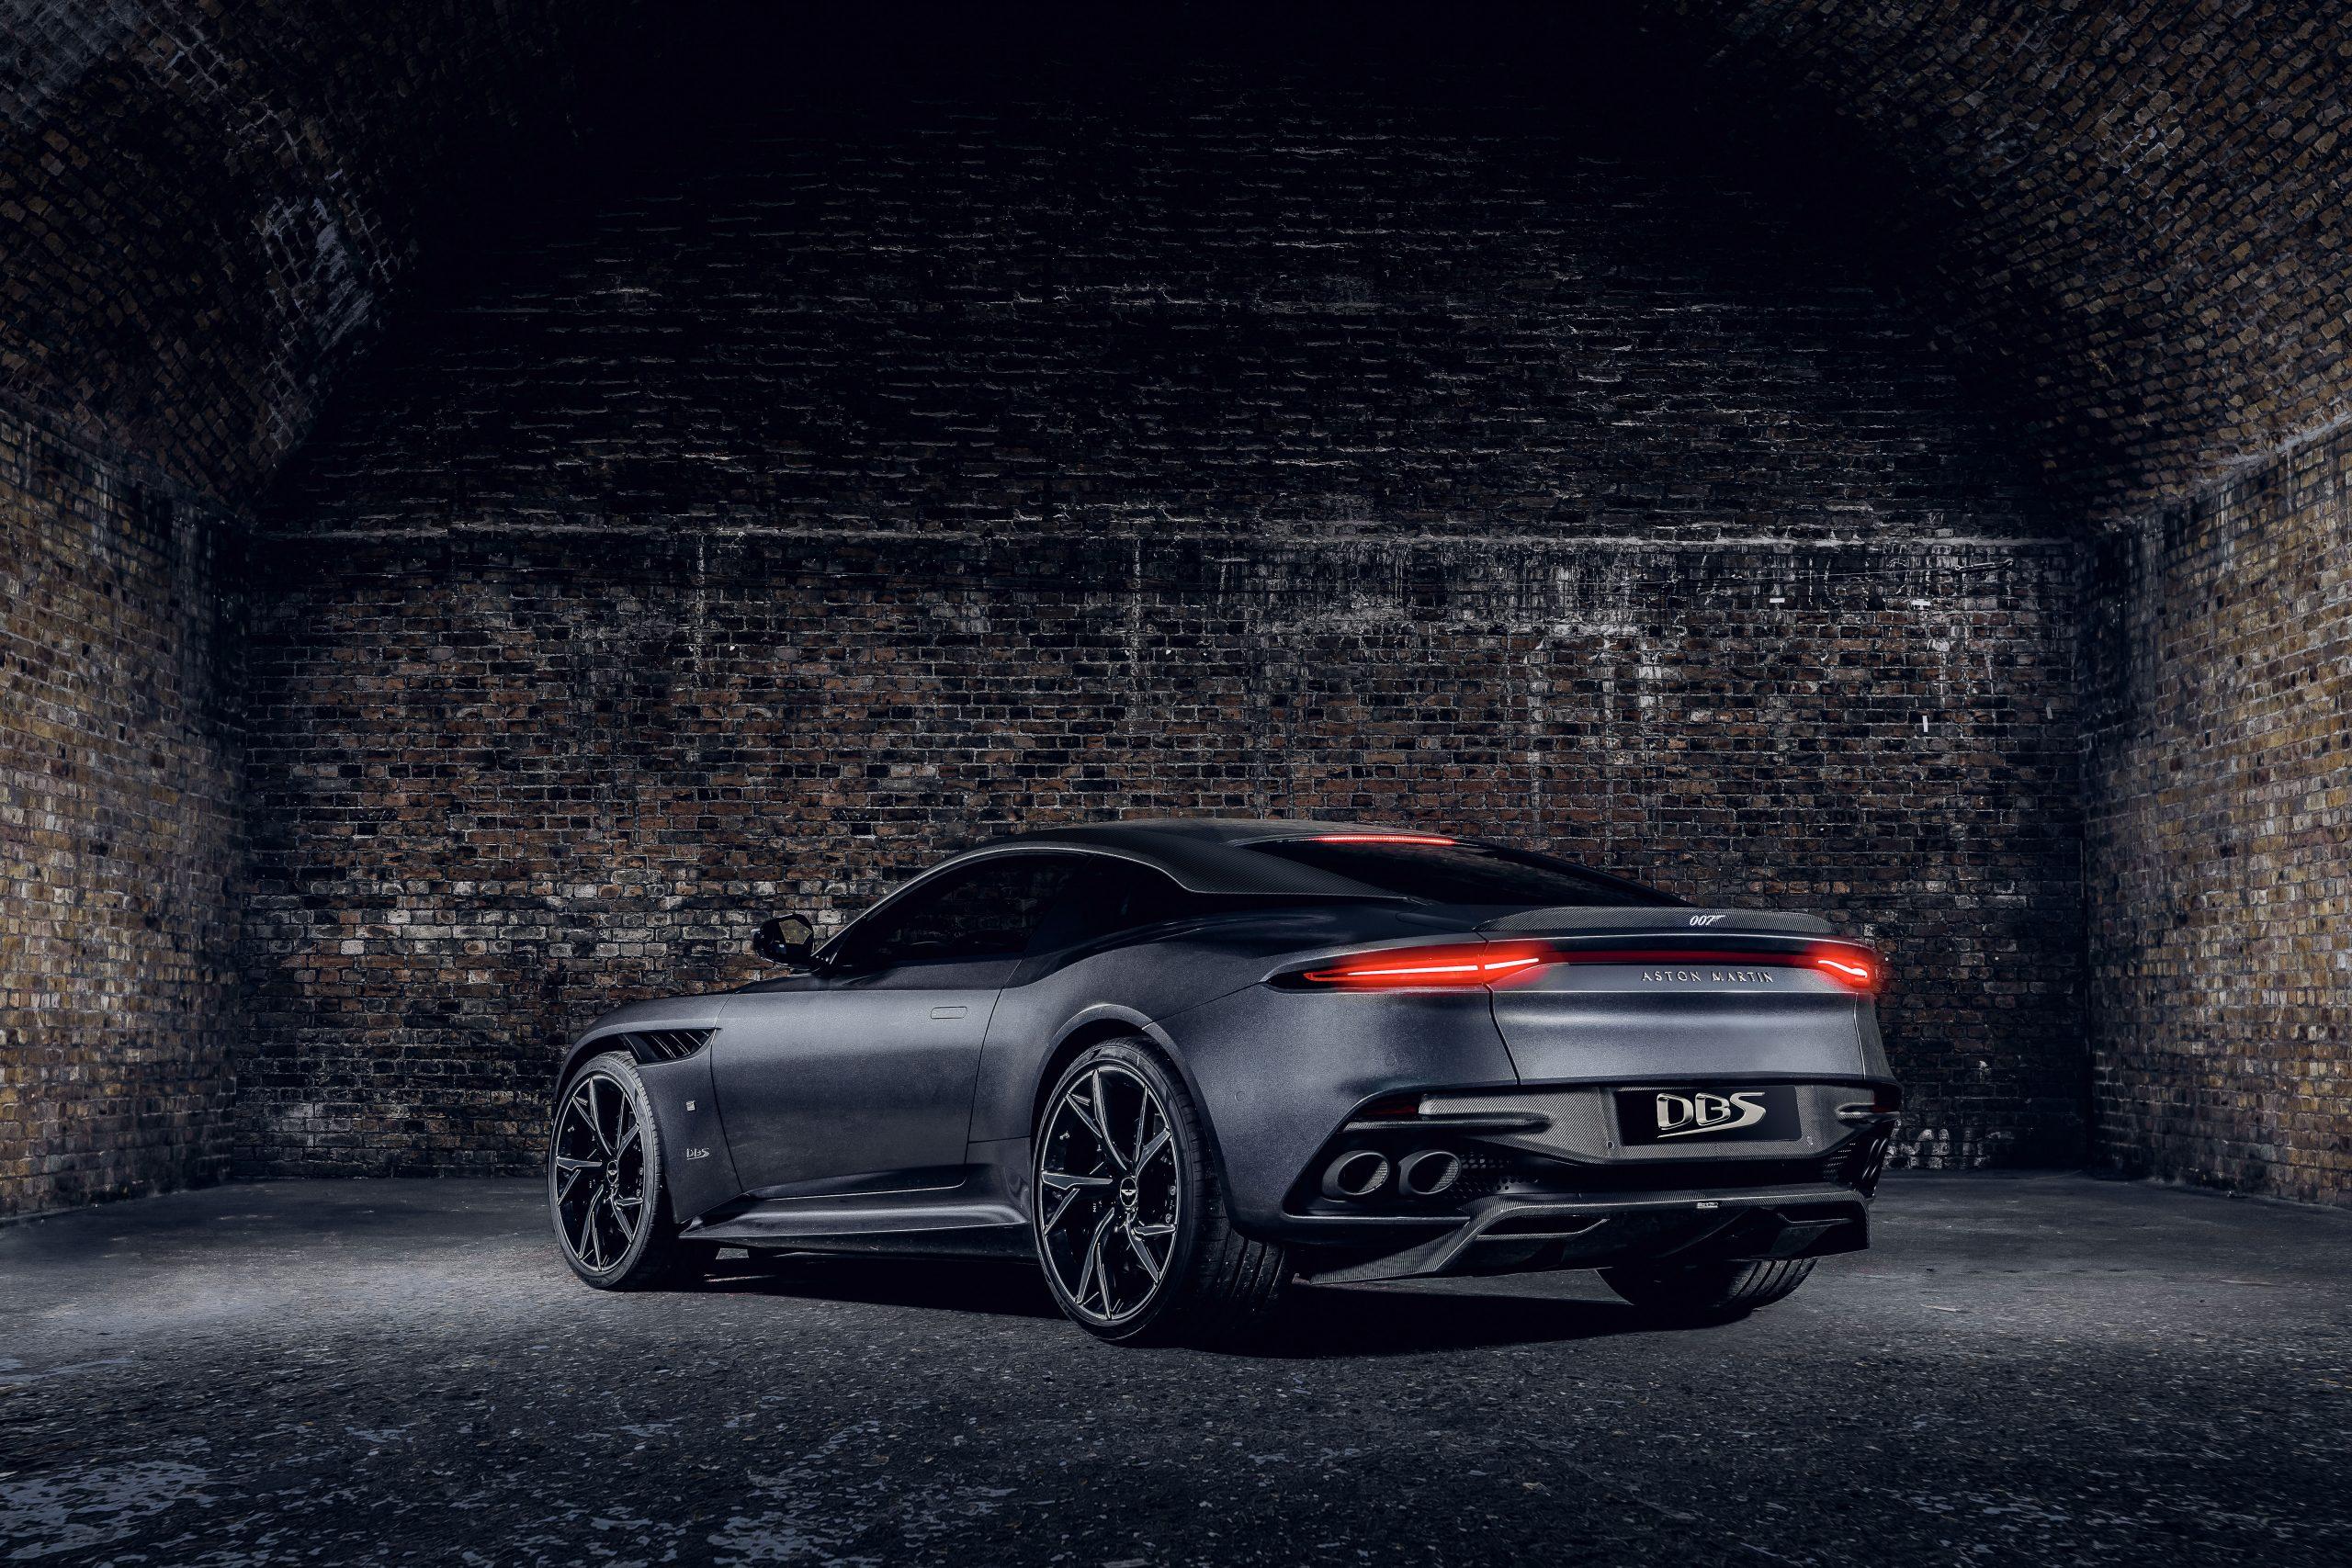 Aston Martin Vantage 007 Edition rear three-quarter